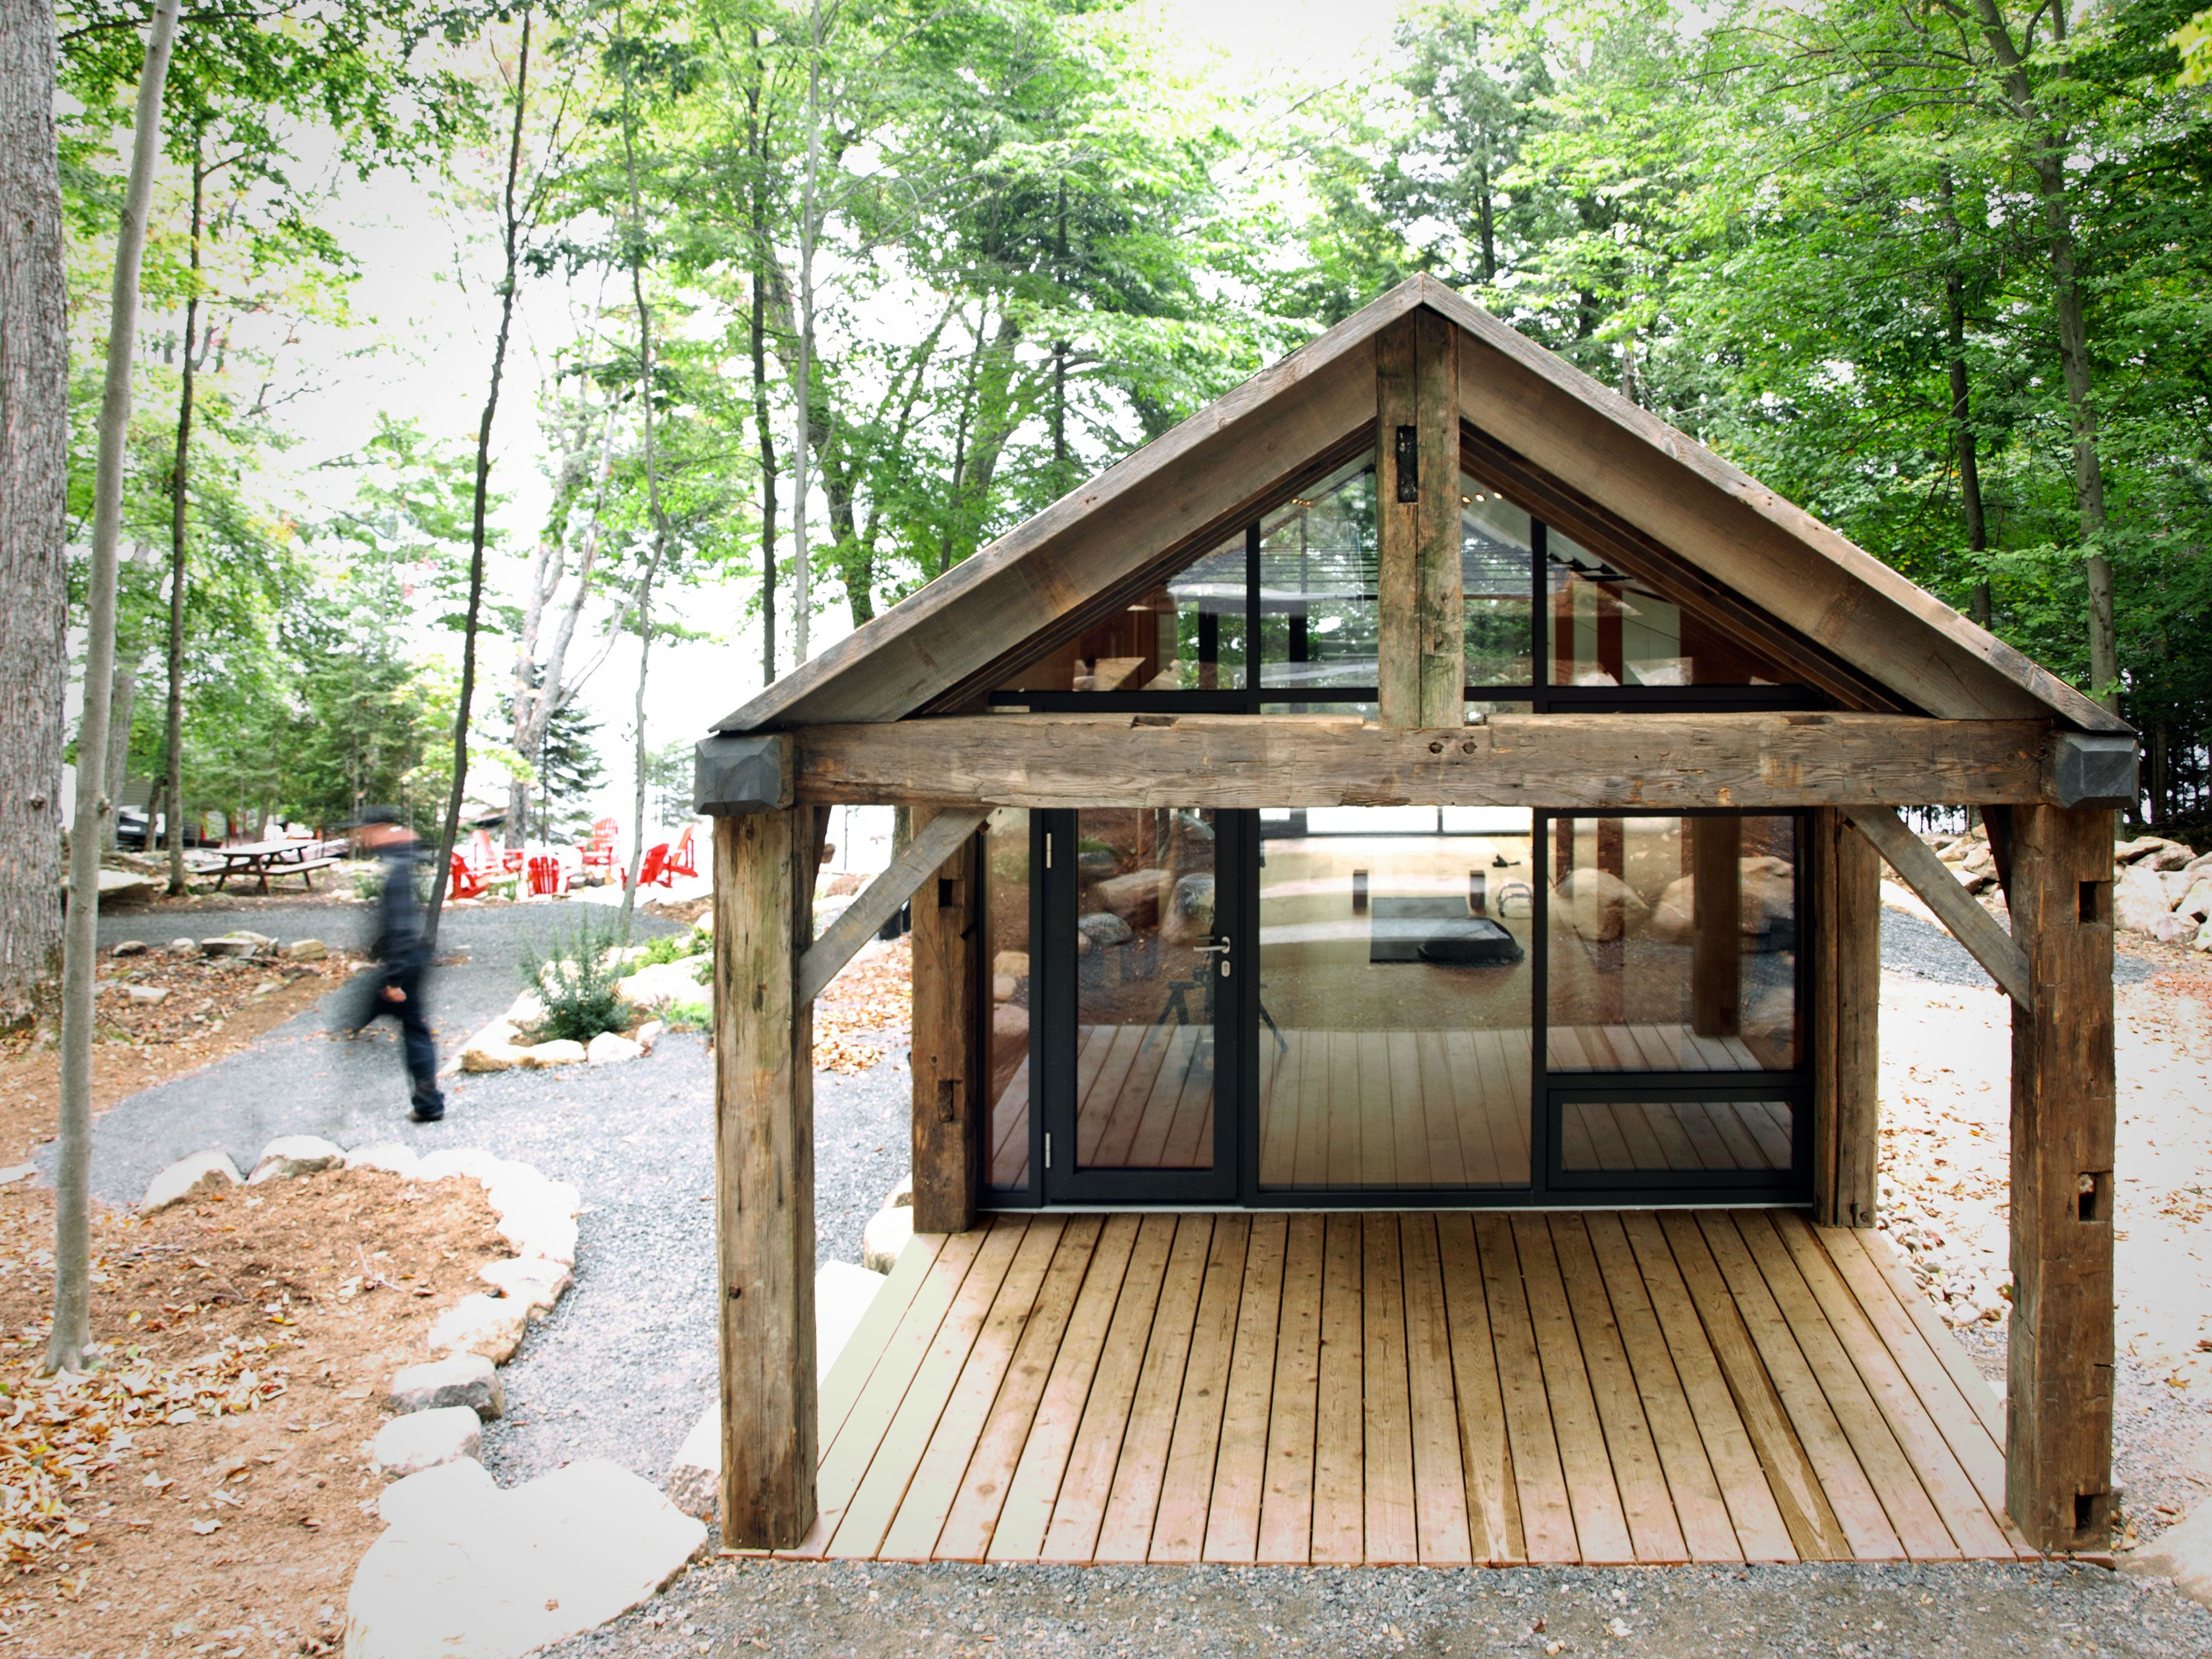 High Tech Prefab Outbuilding Is A Surprisingly Peaceful Retreat Cabin Design Yoga Studio Design Cabin